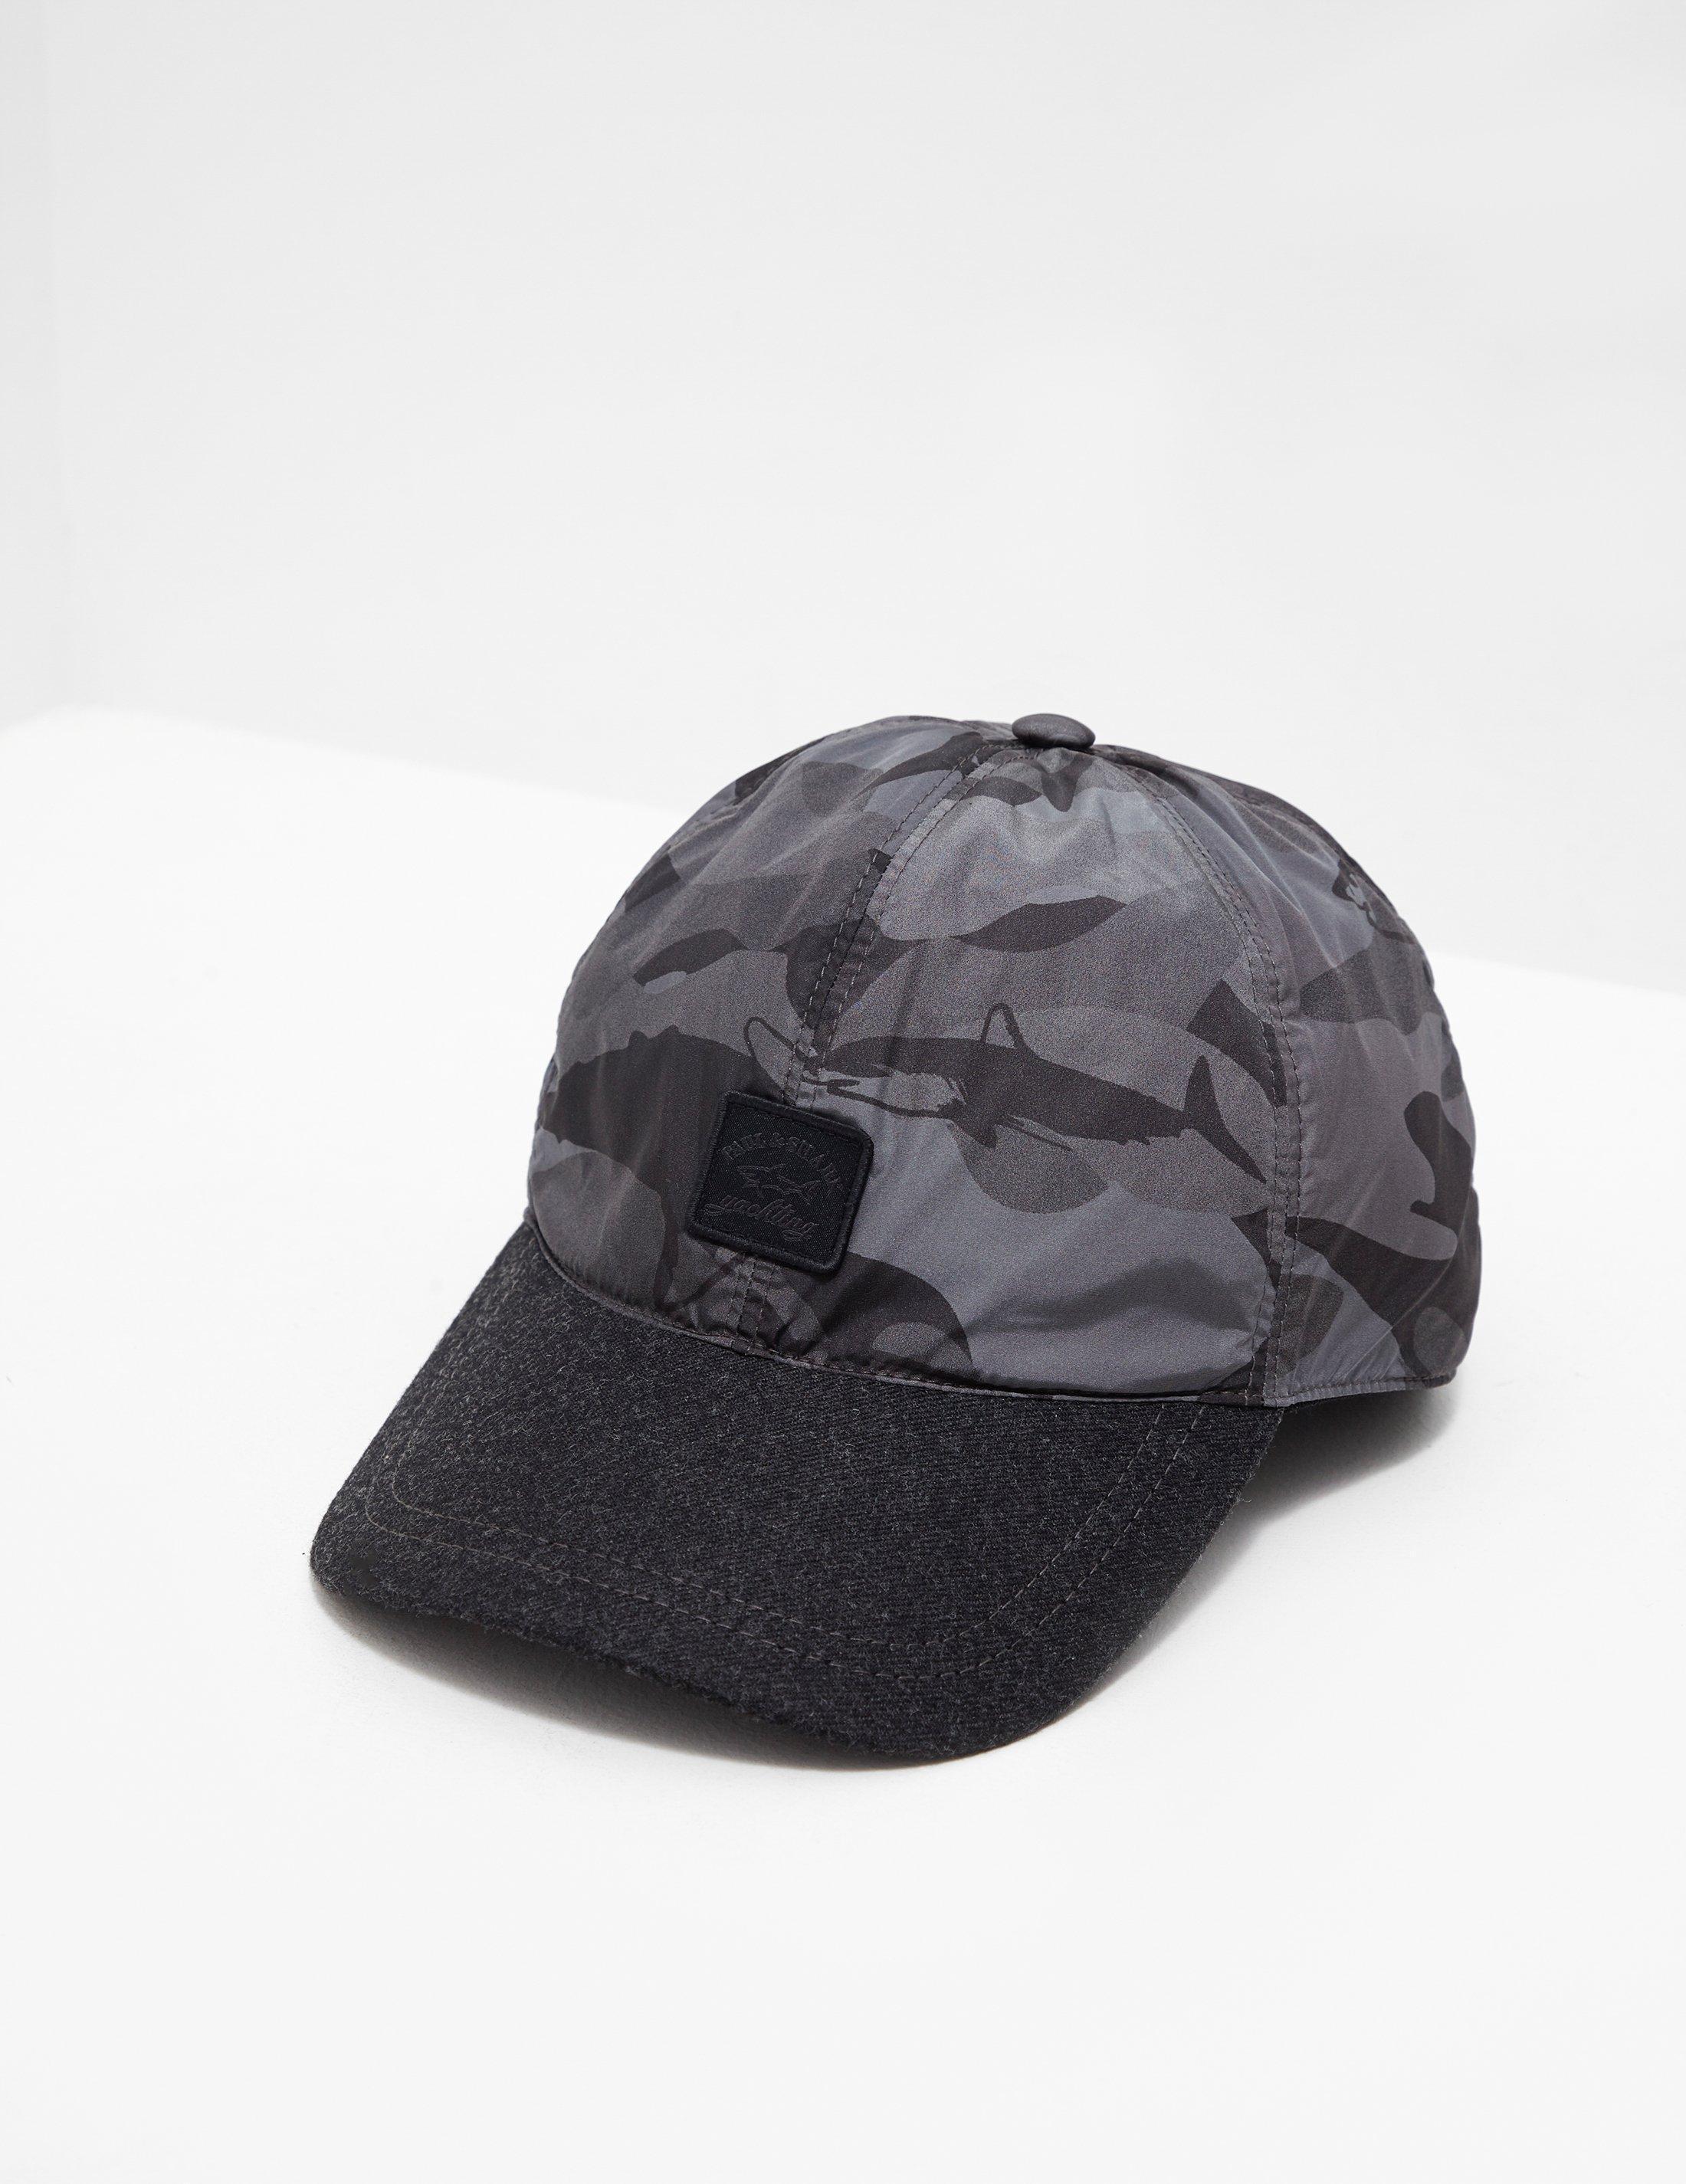 6c4059370f2 Paul And Shark Mens Sharkflage Cap Black in Black for Men - Lyst